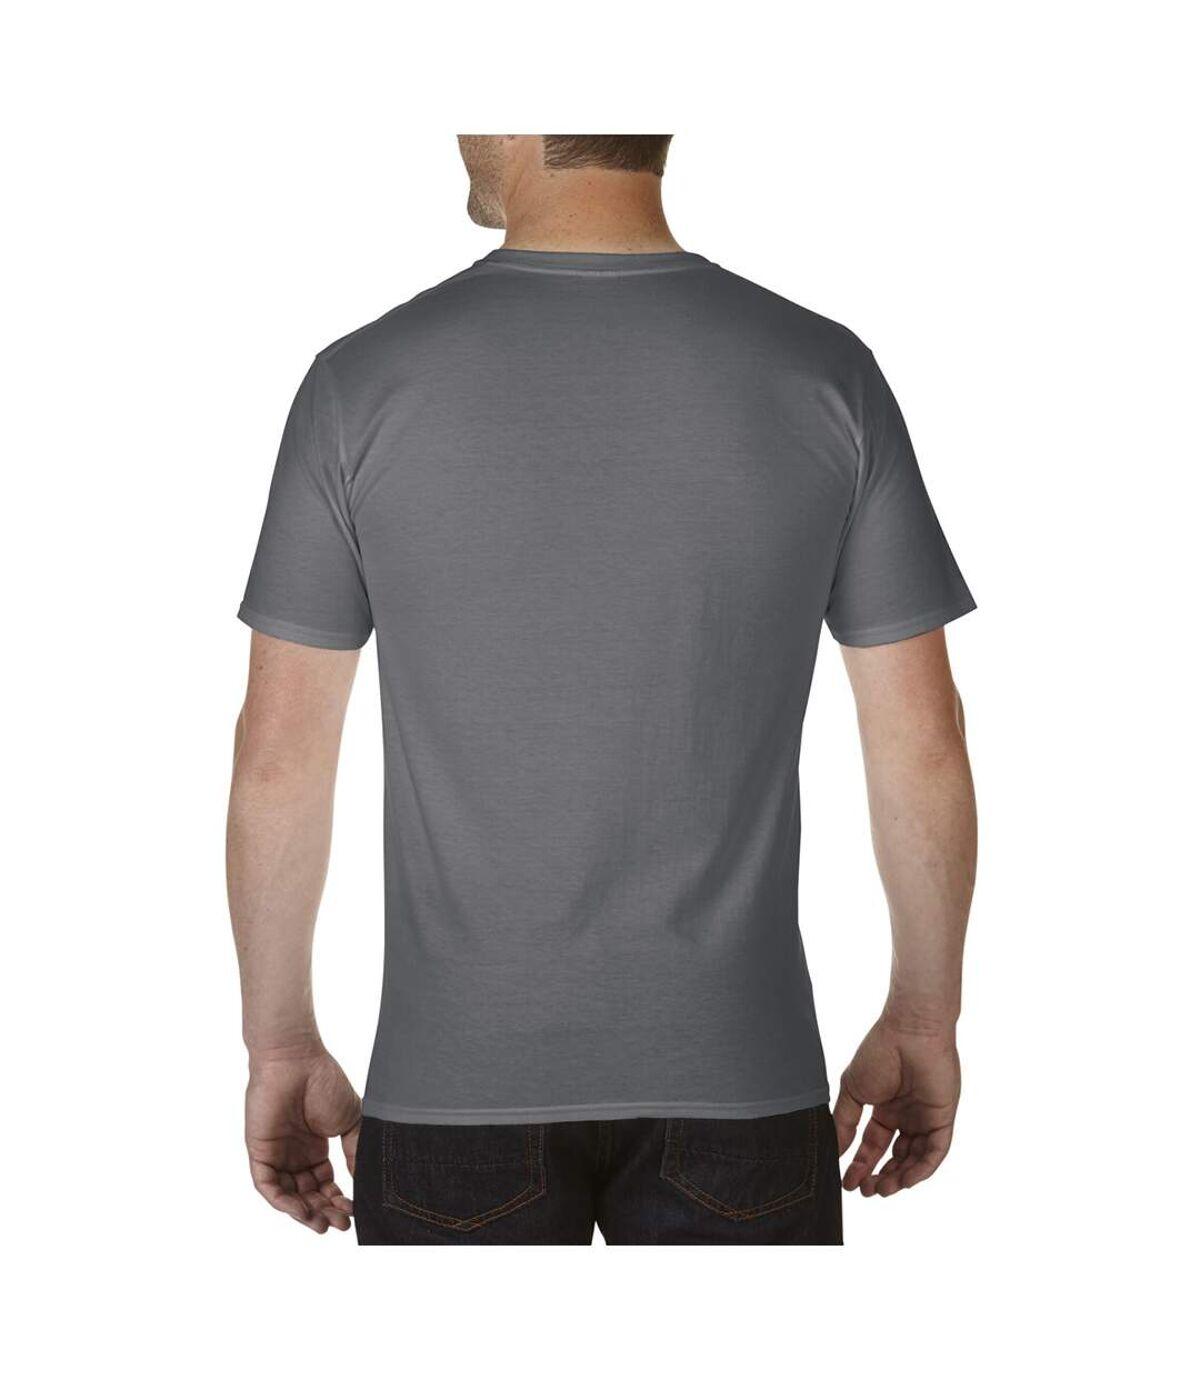 Gildan Mens Premium Cotton V Neck Short Sleeve T-Shirt (Charcoal) - UTBC3483